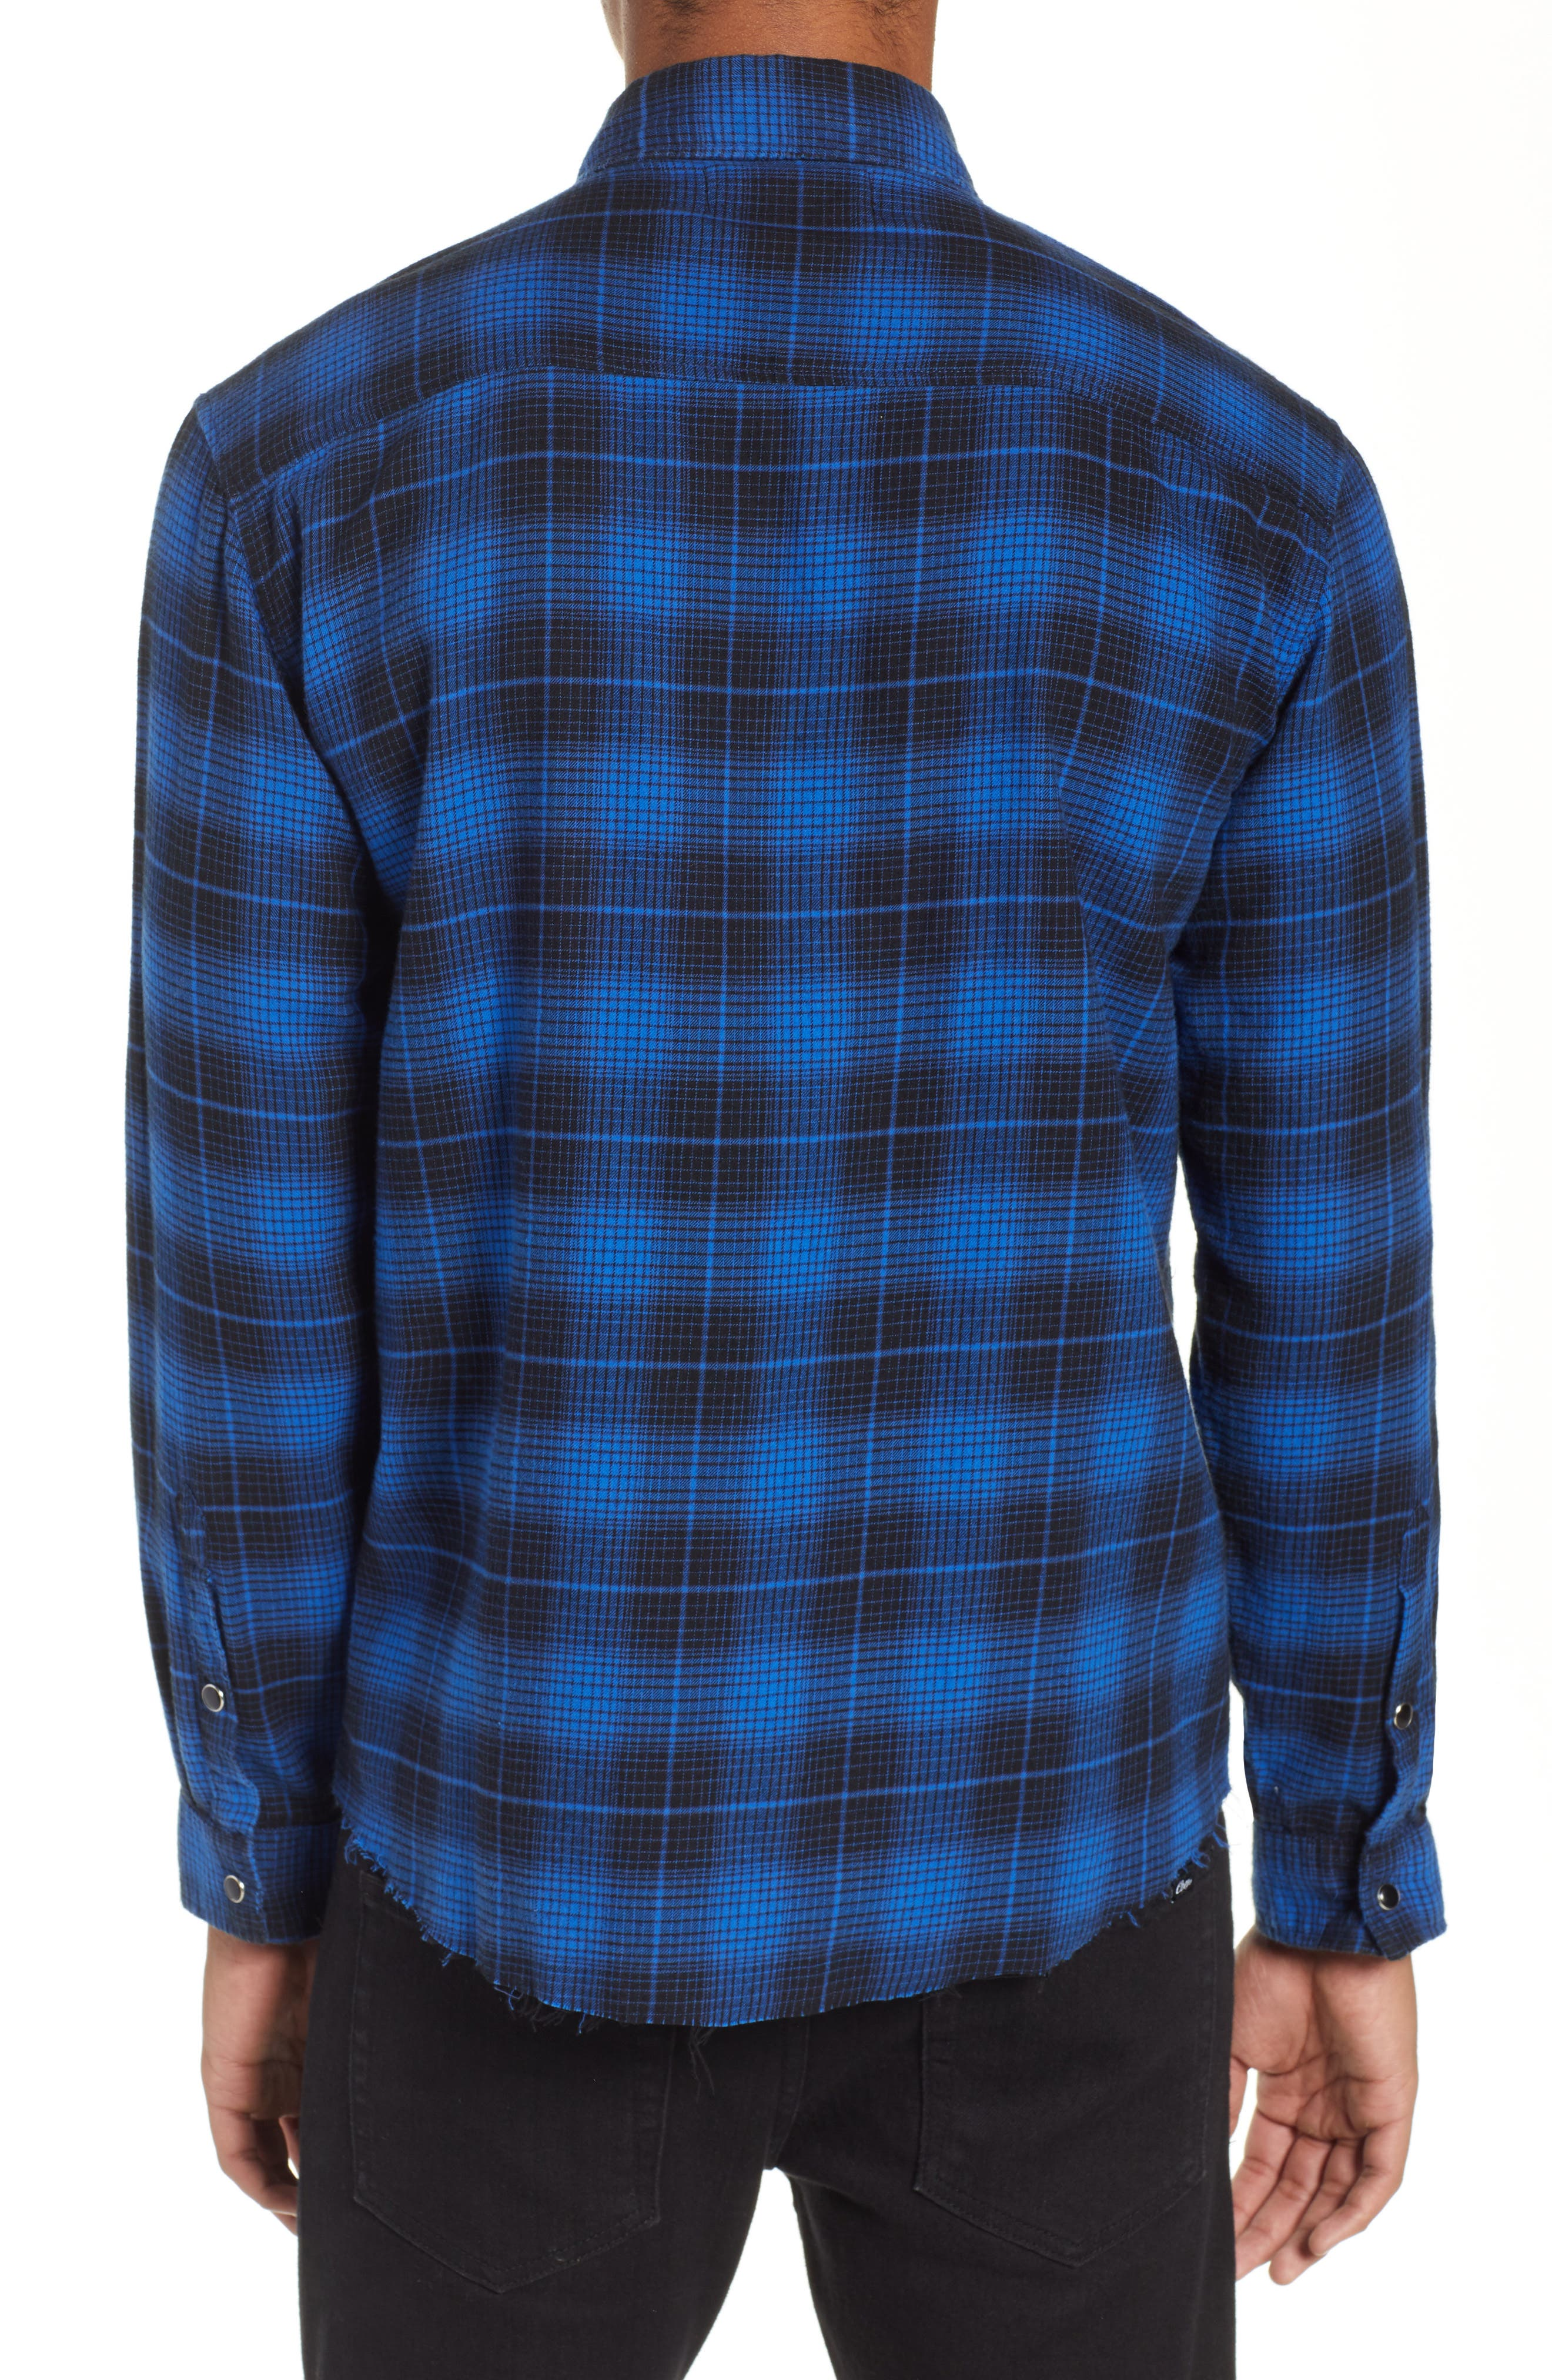 THE KOOPLES, Plaid Flannel Shirt, Alternate thumbnail 3, color, 400